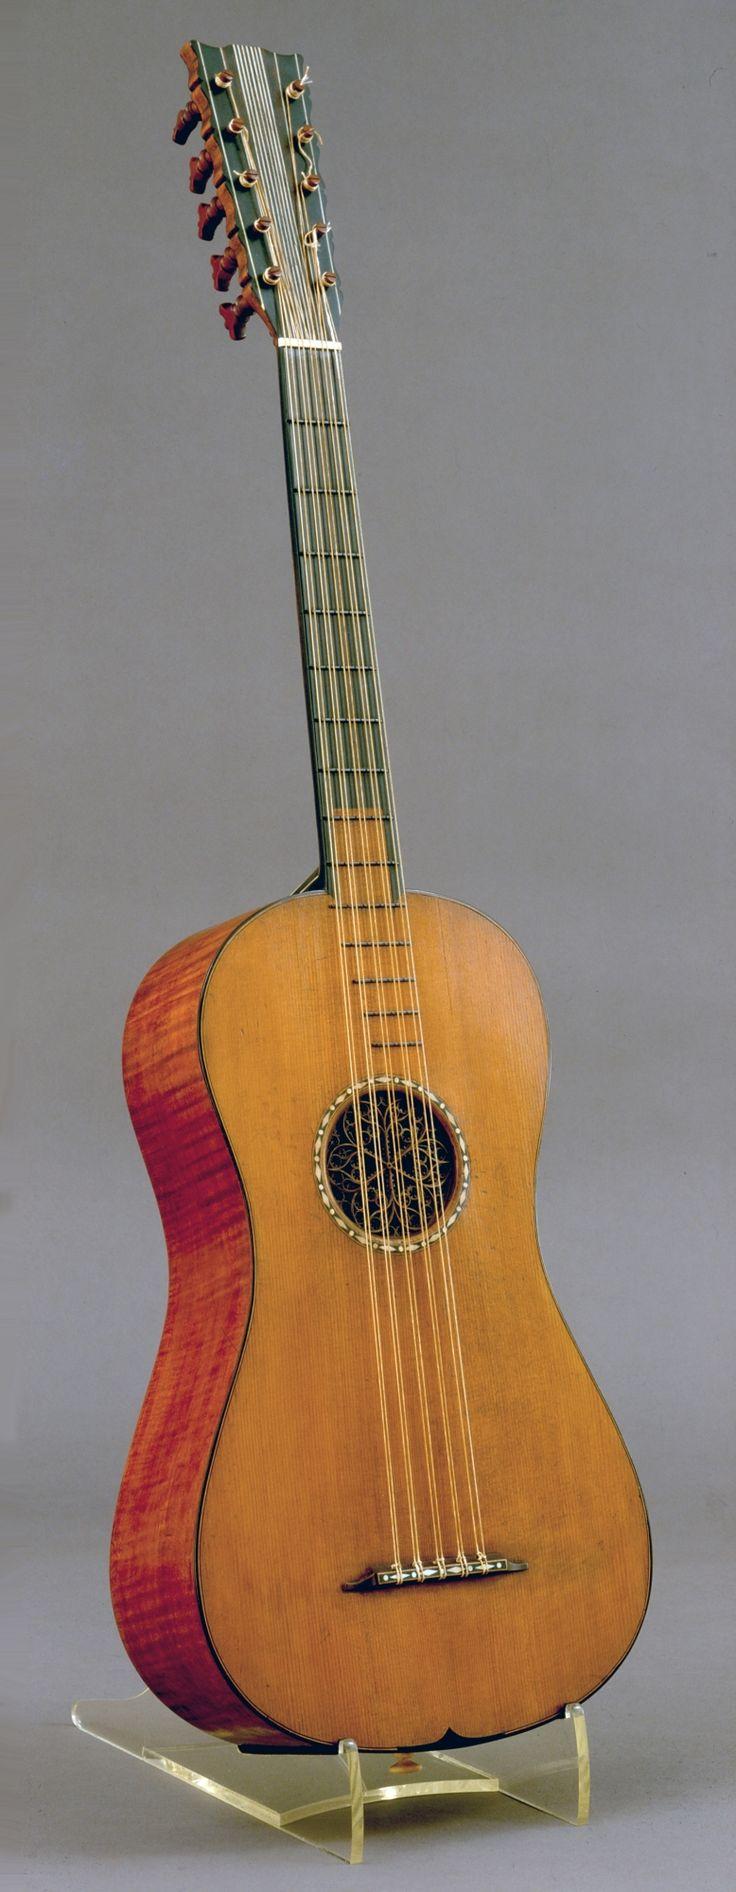 Antonio Stradivari (Italian, 1644–1737) - Guitar, The Rawlins, 1700 - Spruce, maple, ebony - National Music Museum, The University of South Dakota, Vermillion